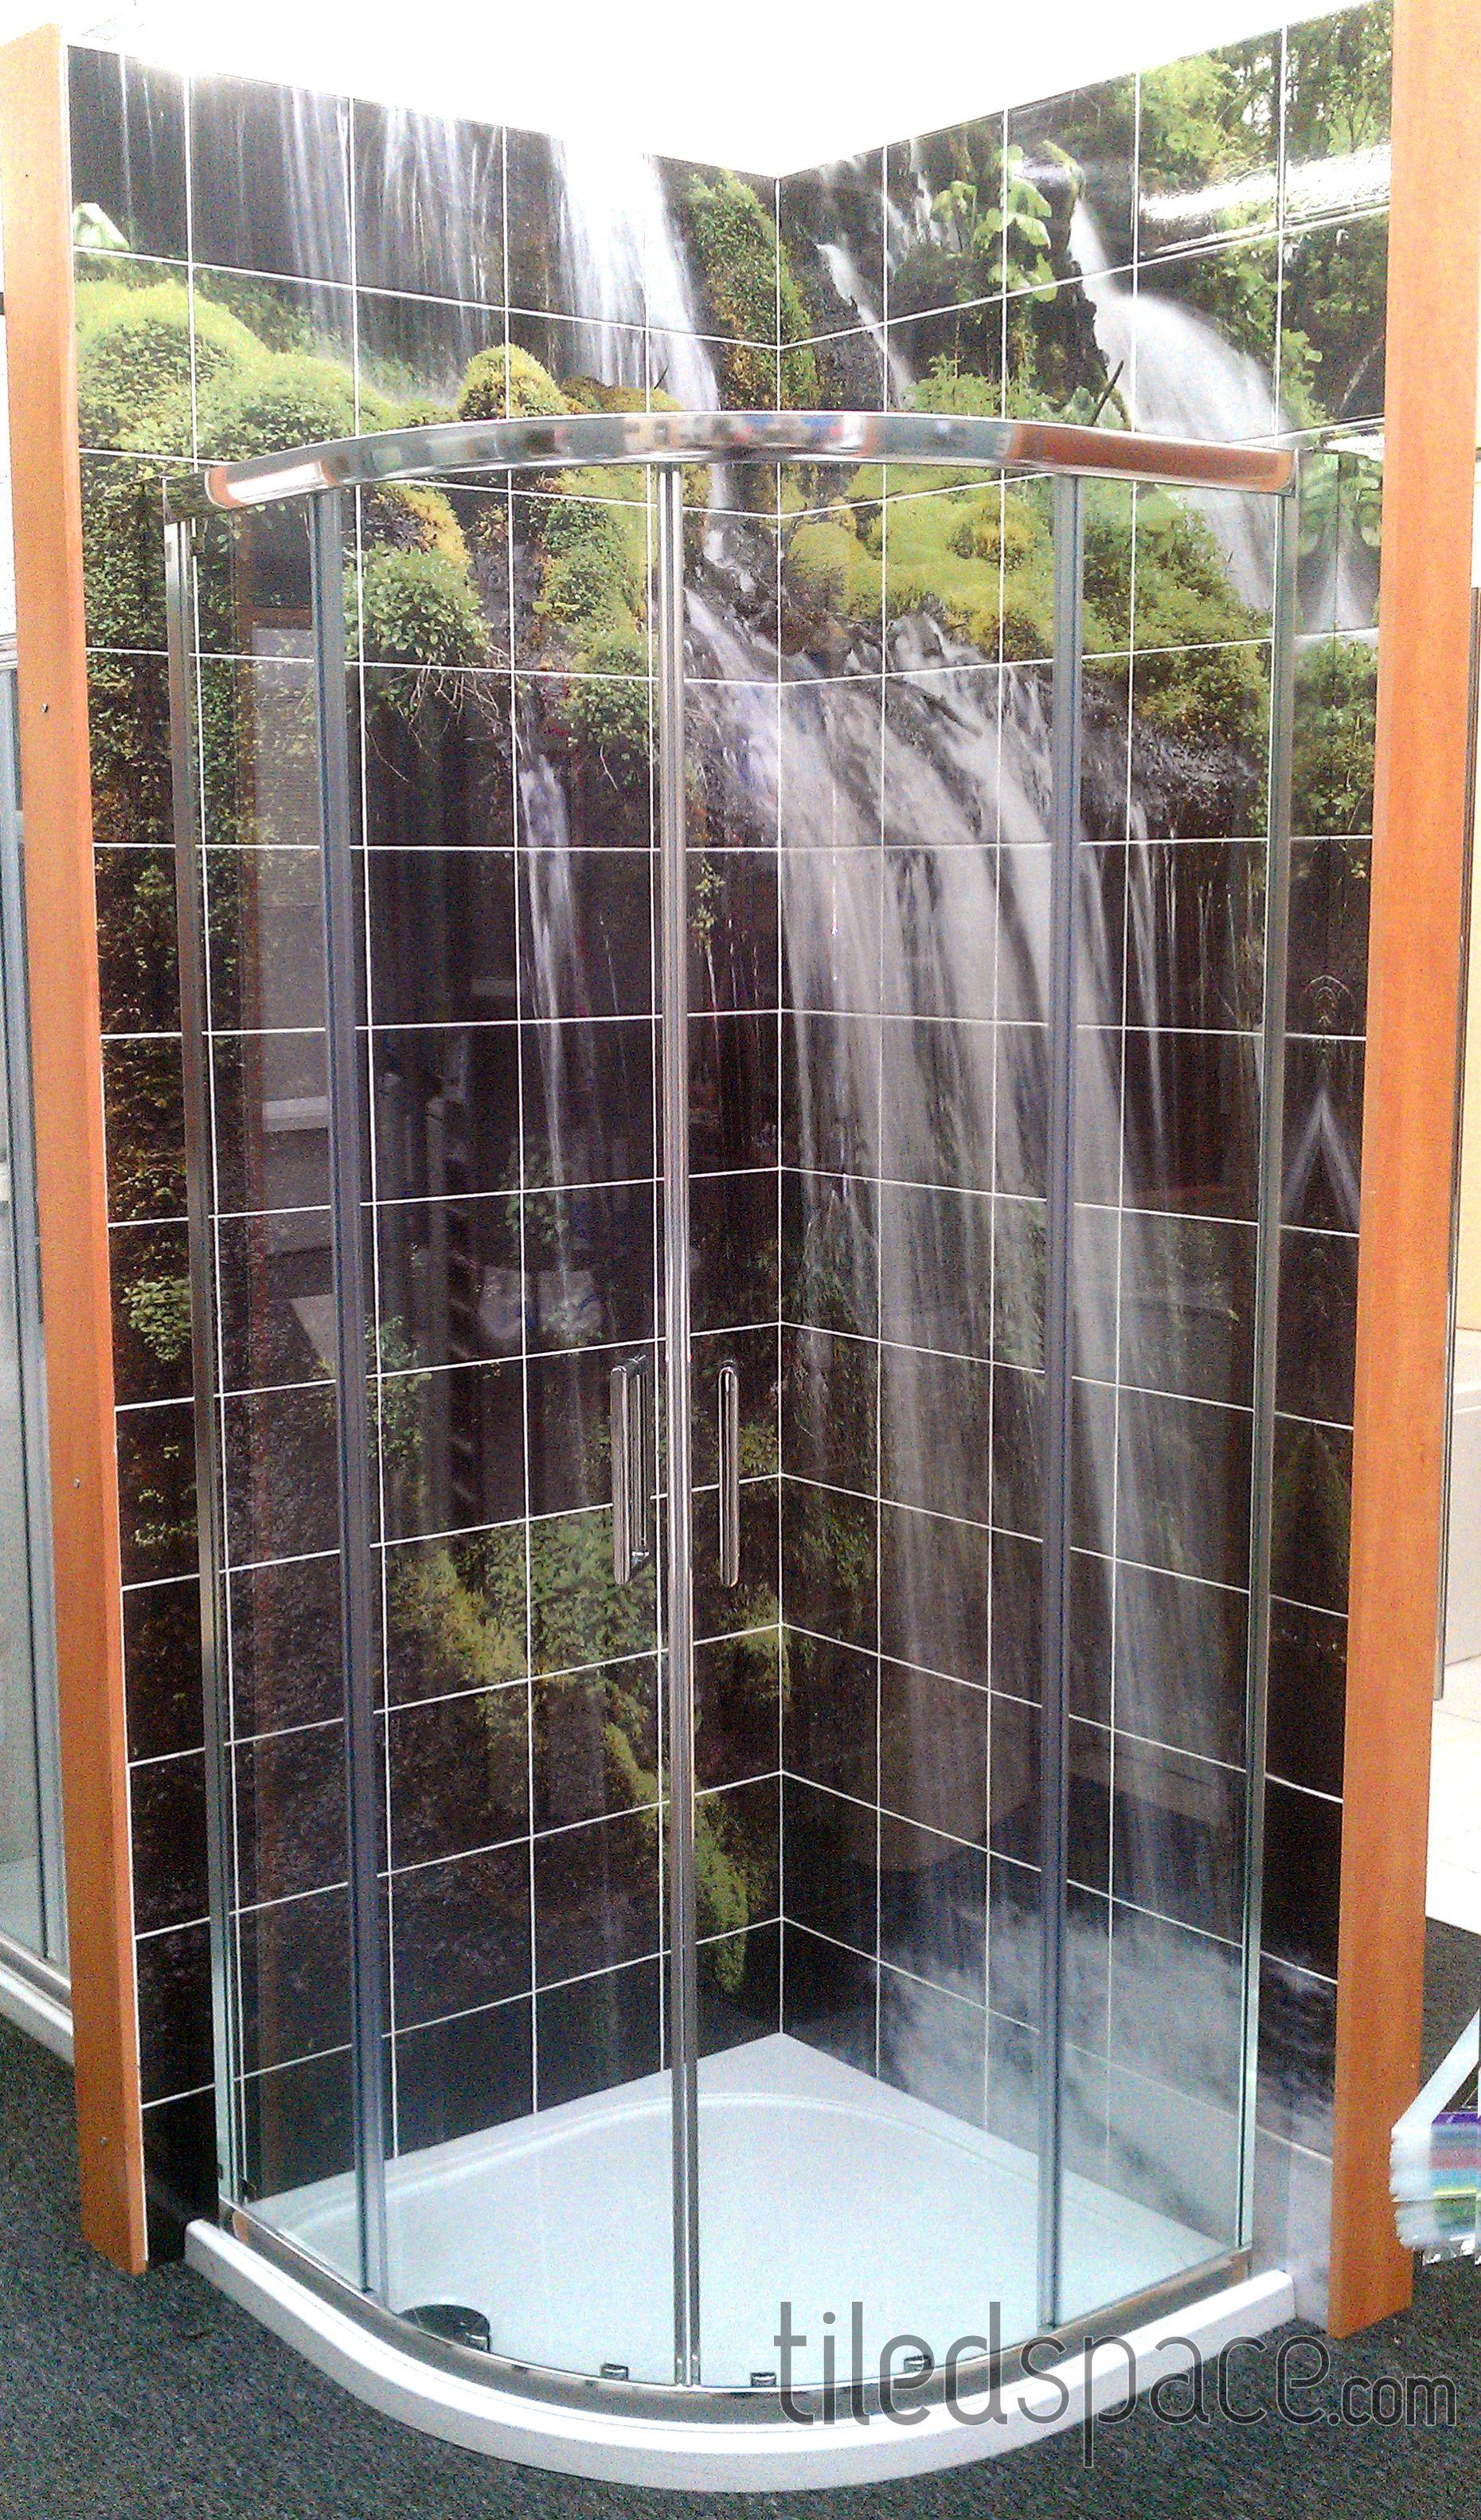 Relaxing Waterfall Tiled Mural In Your Shower Bathroom Mural Tile Murals Floor Wallpaper